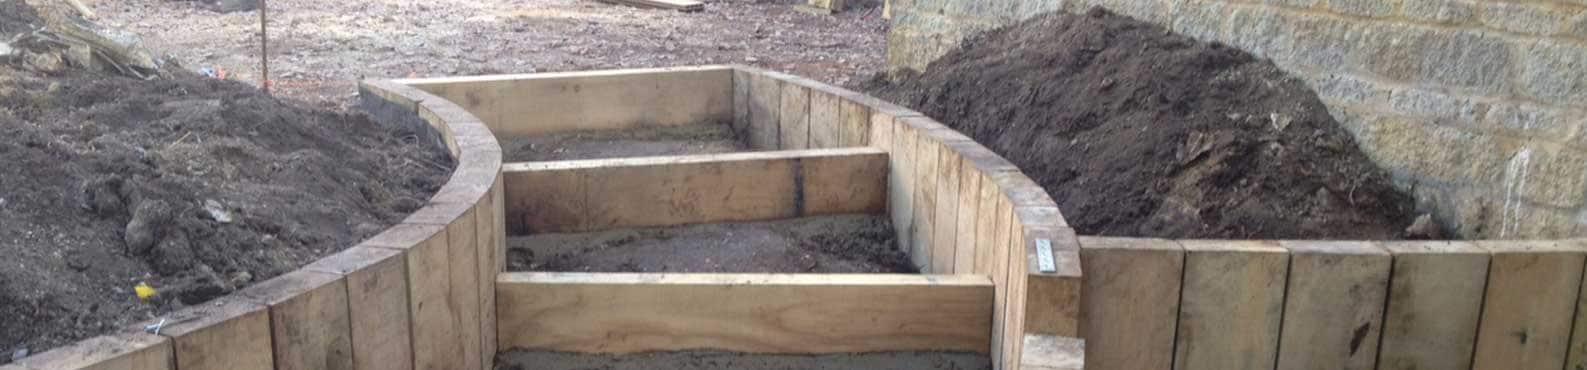 milton keynes garden construction